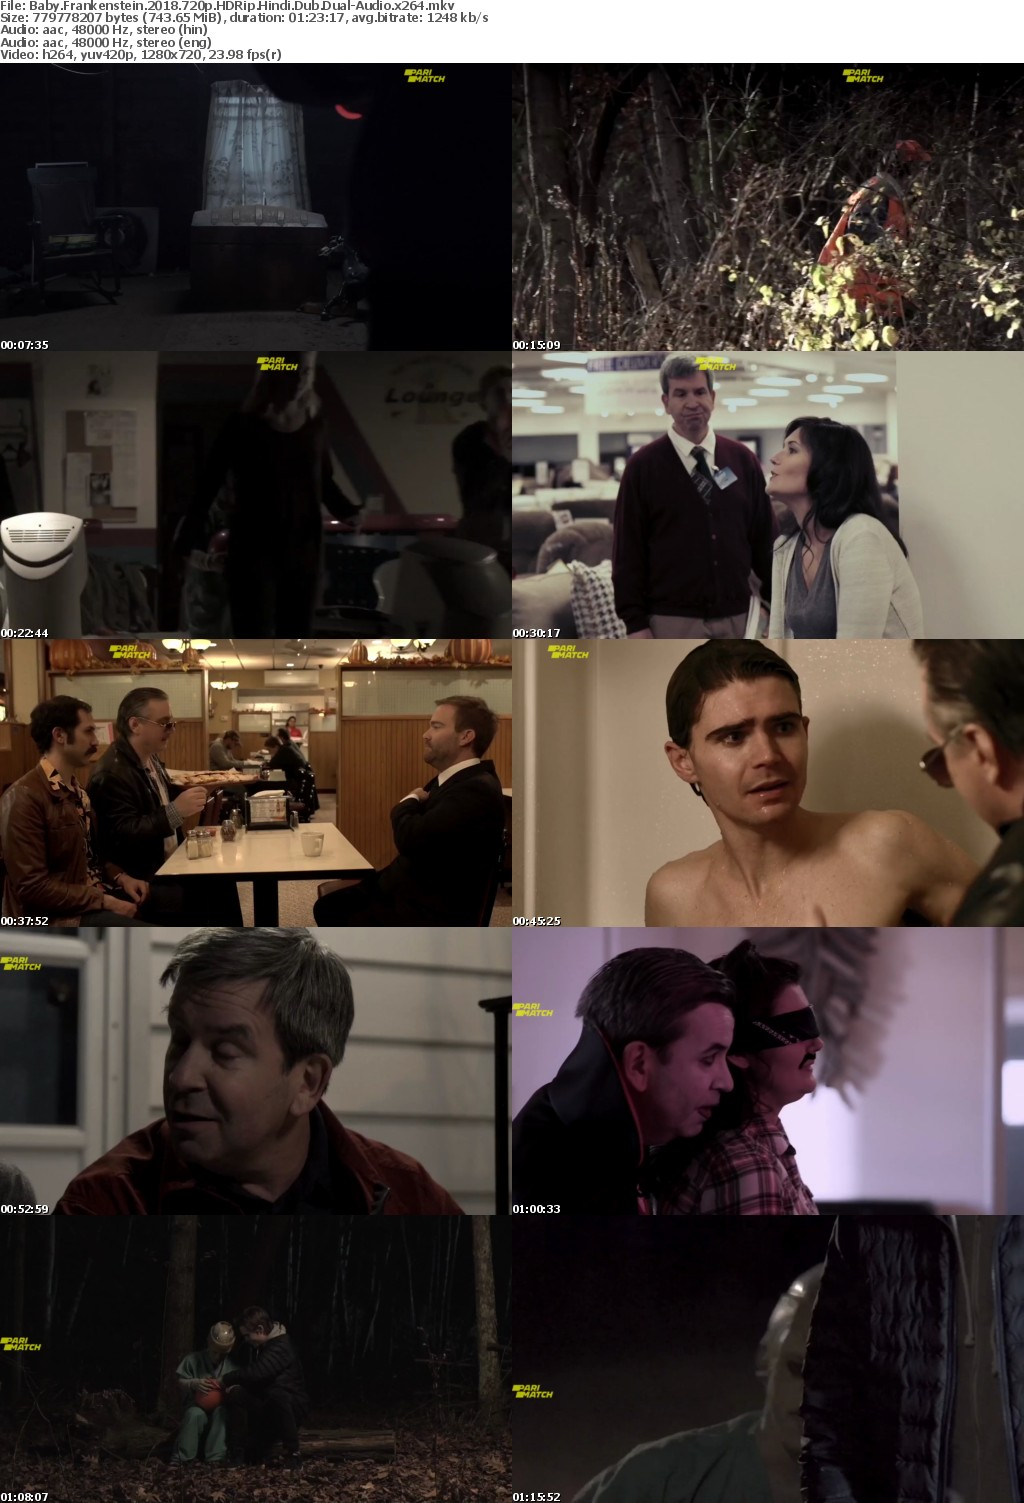 Baby Frankenstein (2018)720p HDRip Hindi-Dub Dual-Audio x264